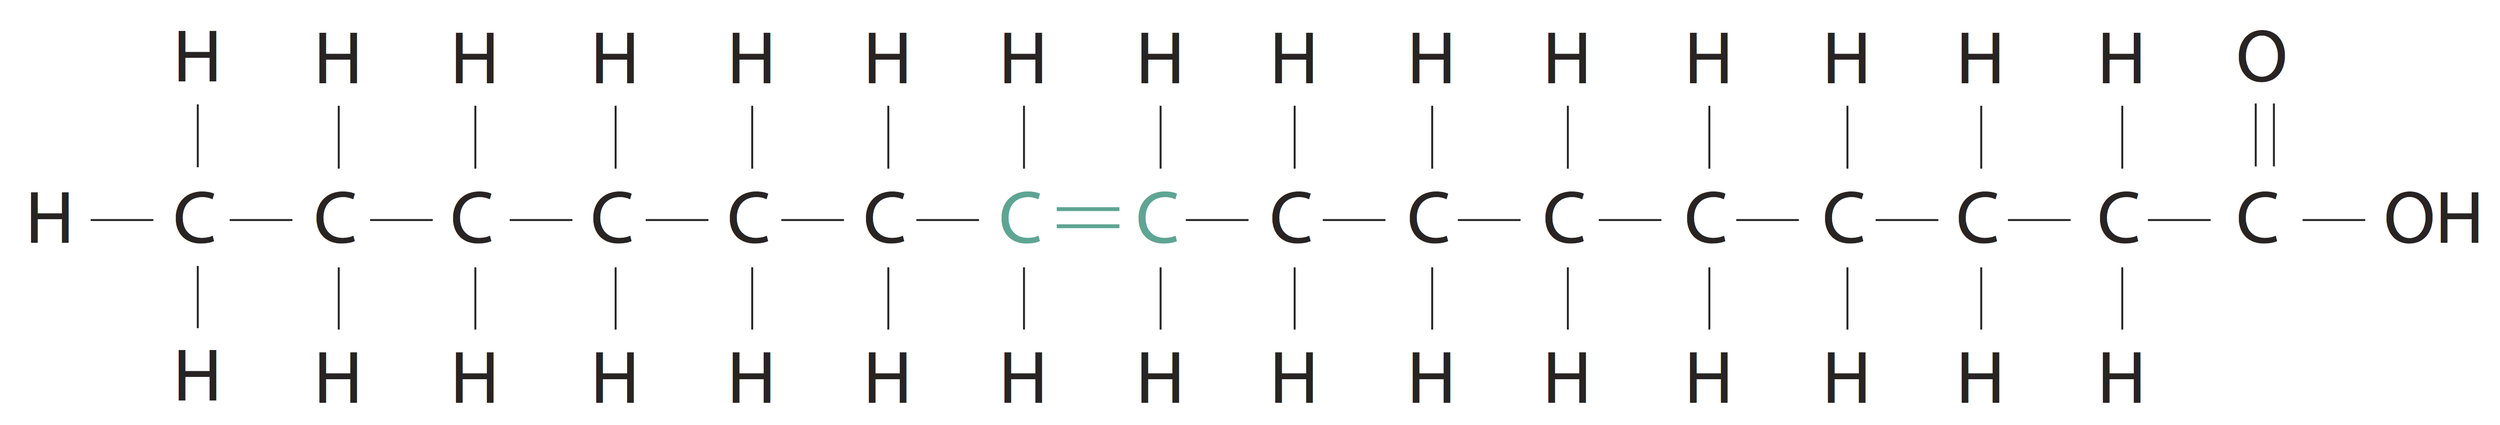 palmitoleic-acid